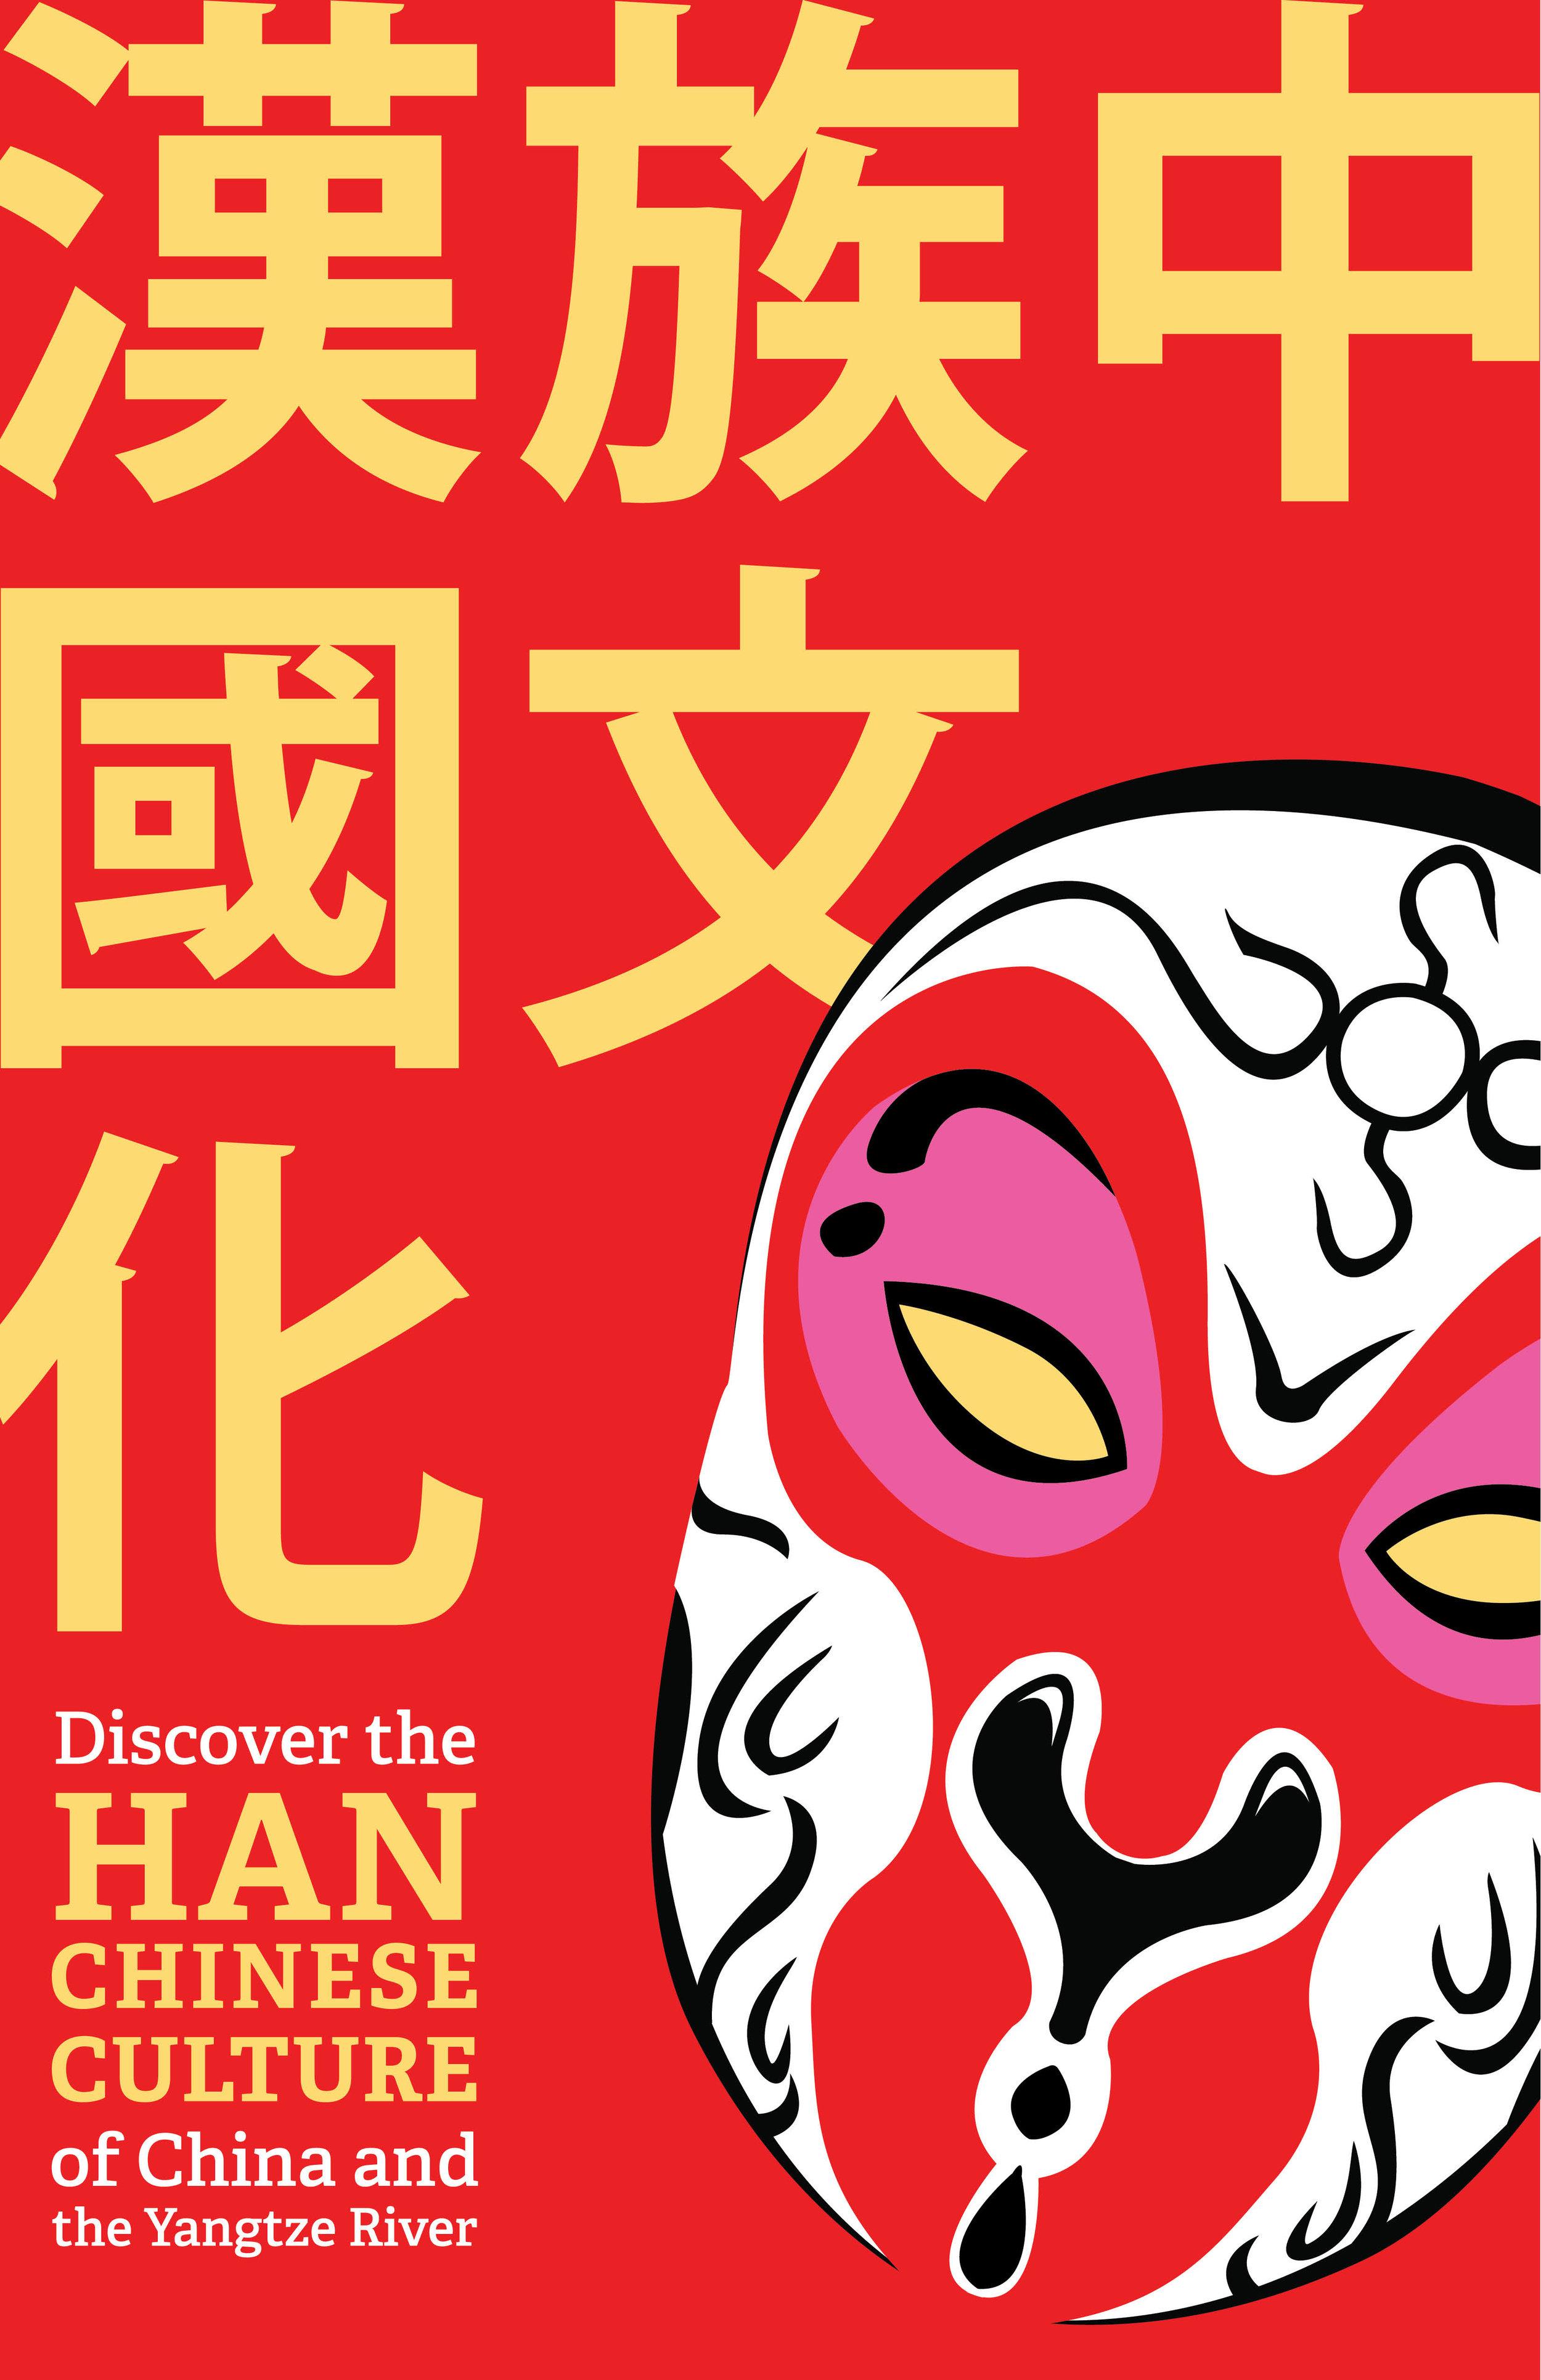 Hans Chinese FINAL Poster II.jpg